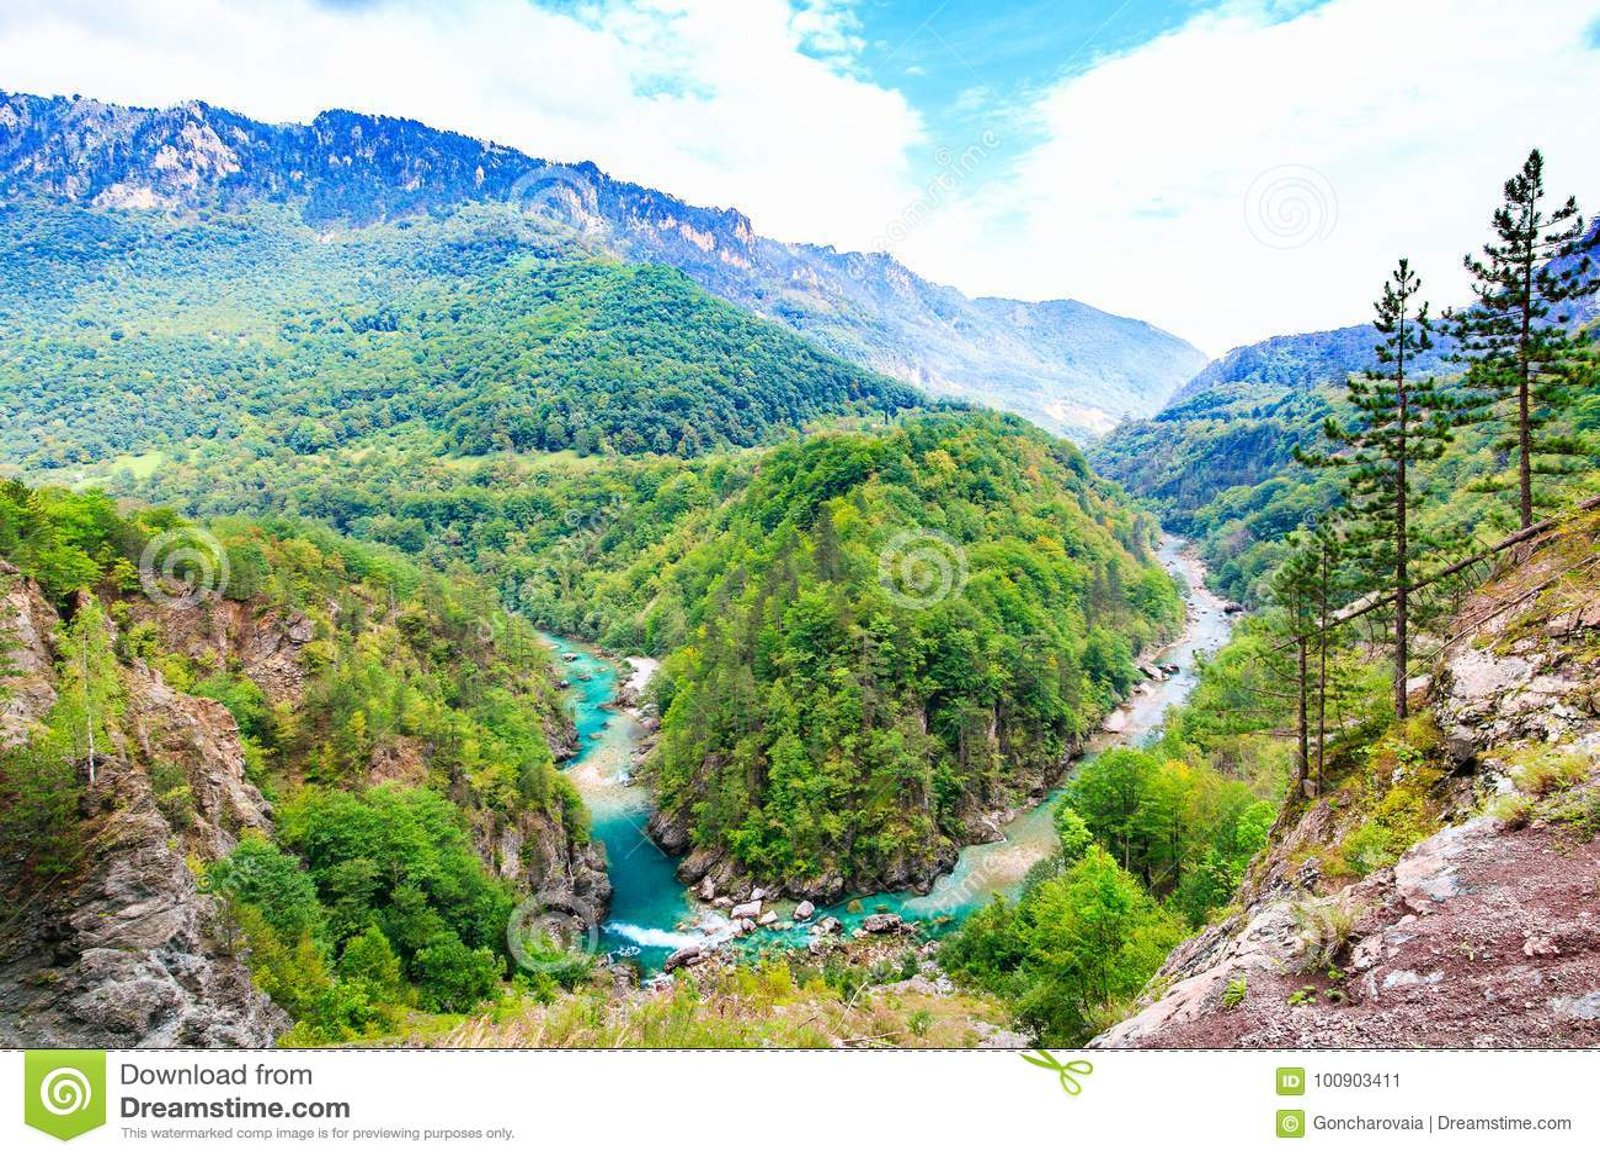 Horizontal de montagne Tara River Canyon, parc national de Durmitor, Monténégro